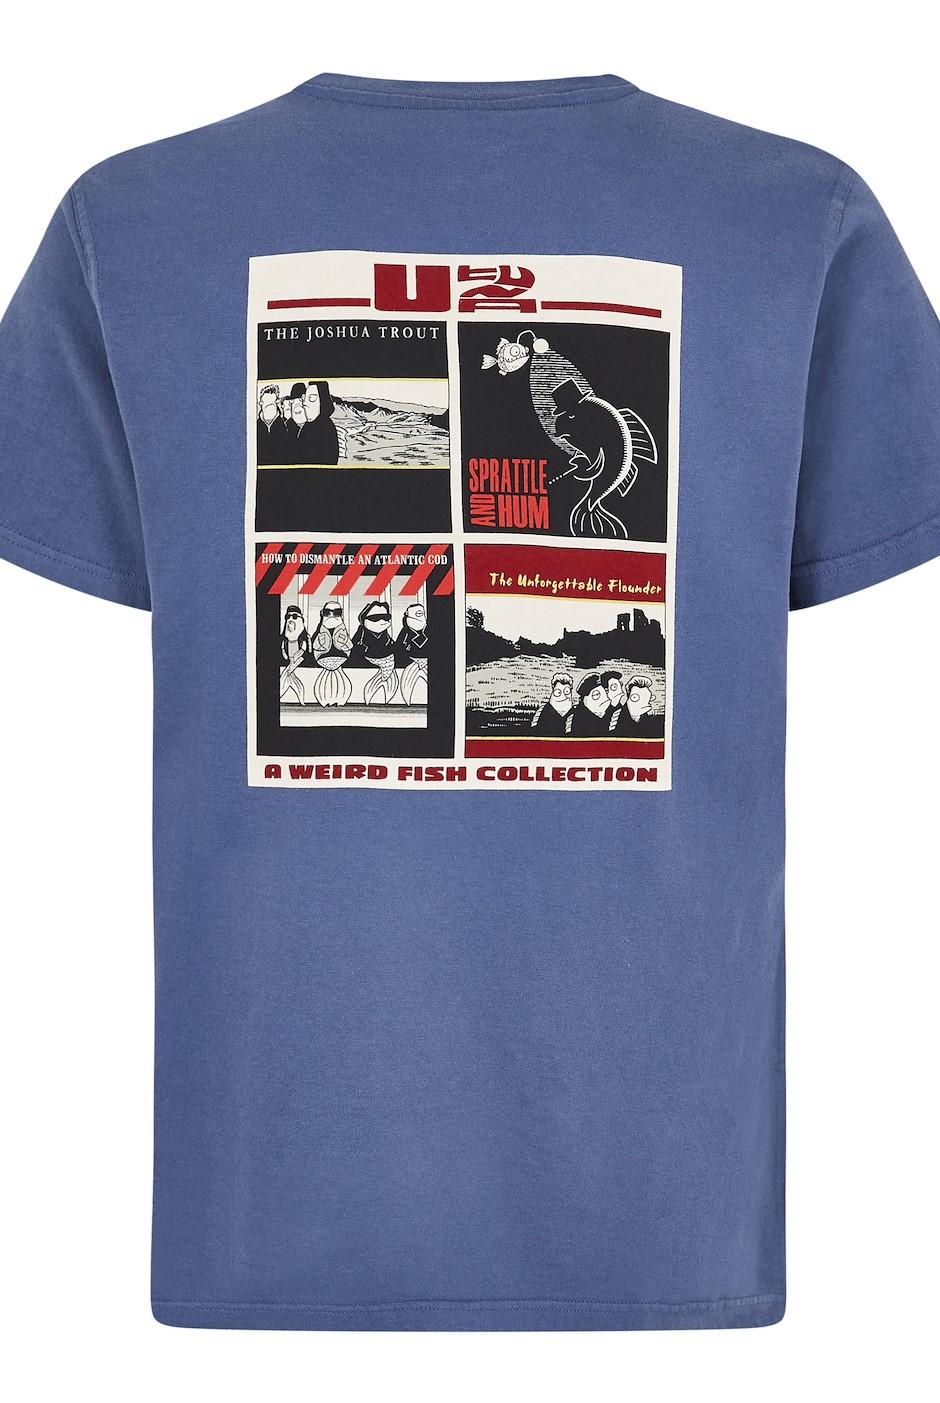 U Tuna Artist T-Shirt Blue Indigo